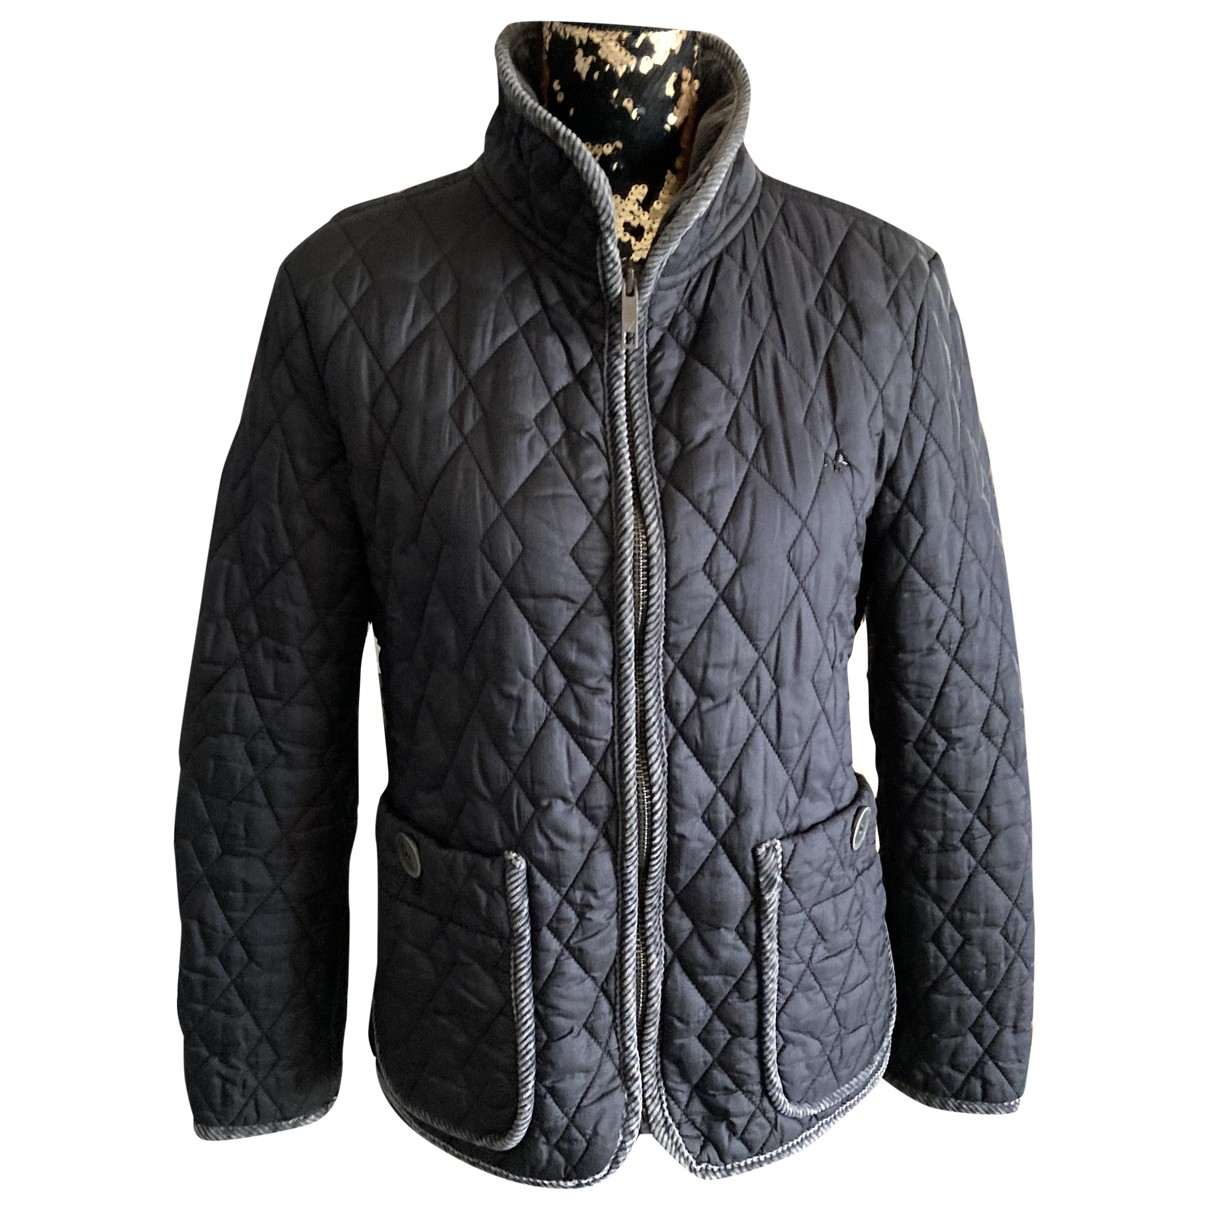 Burberry \N Black jacket for Women L International